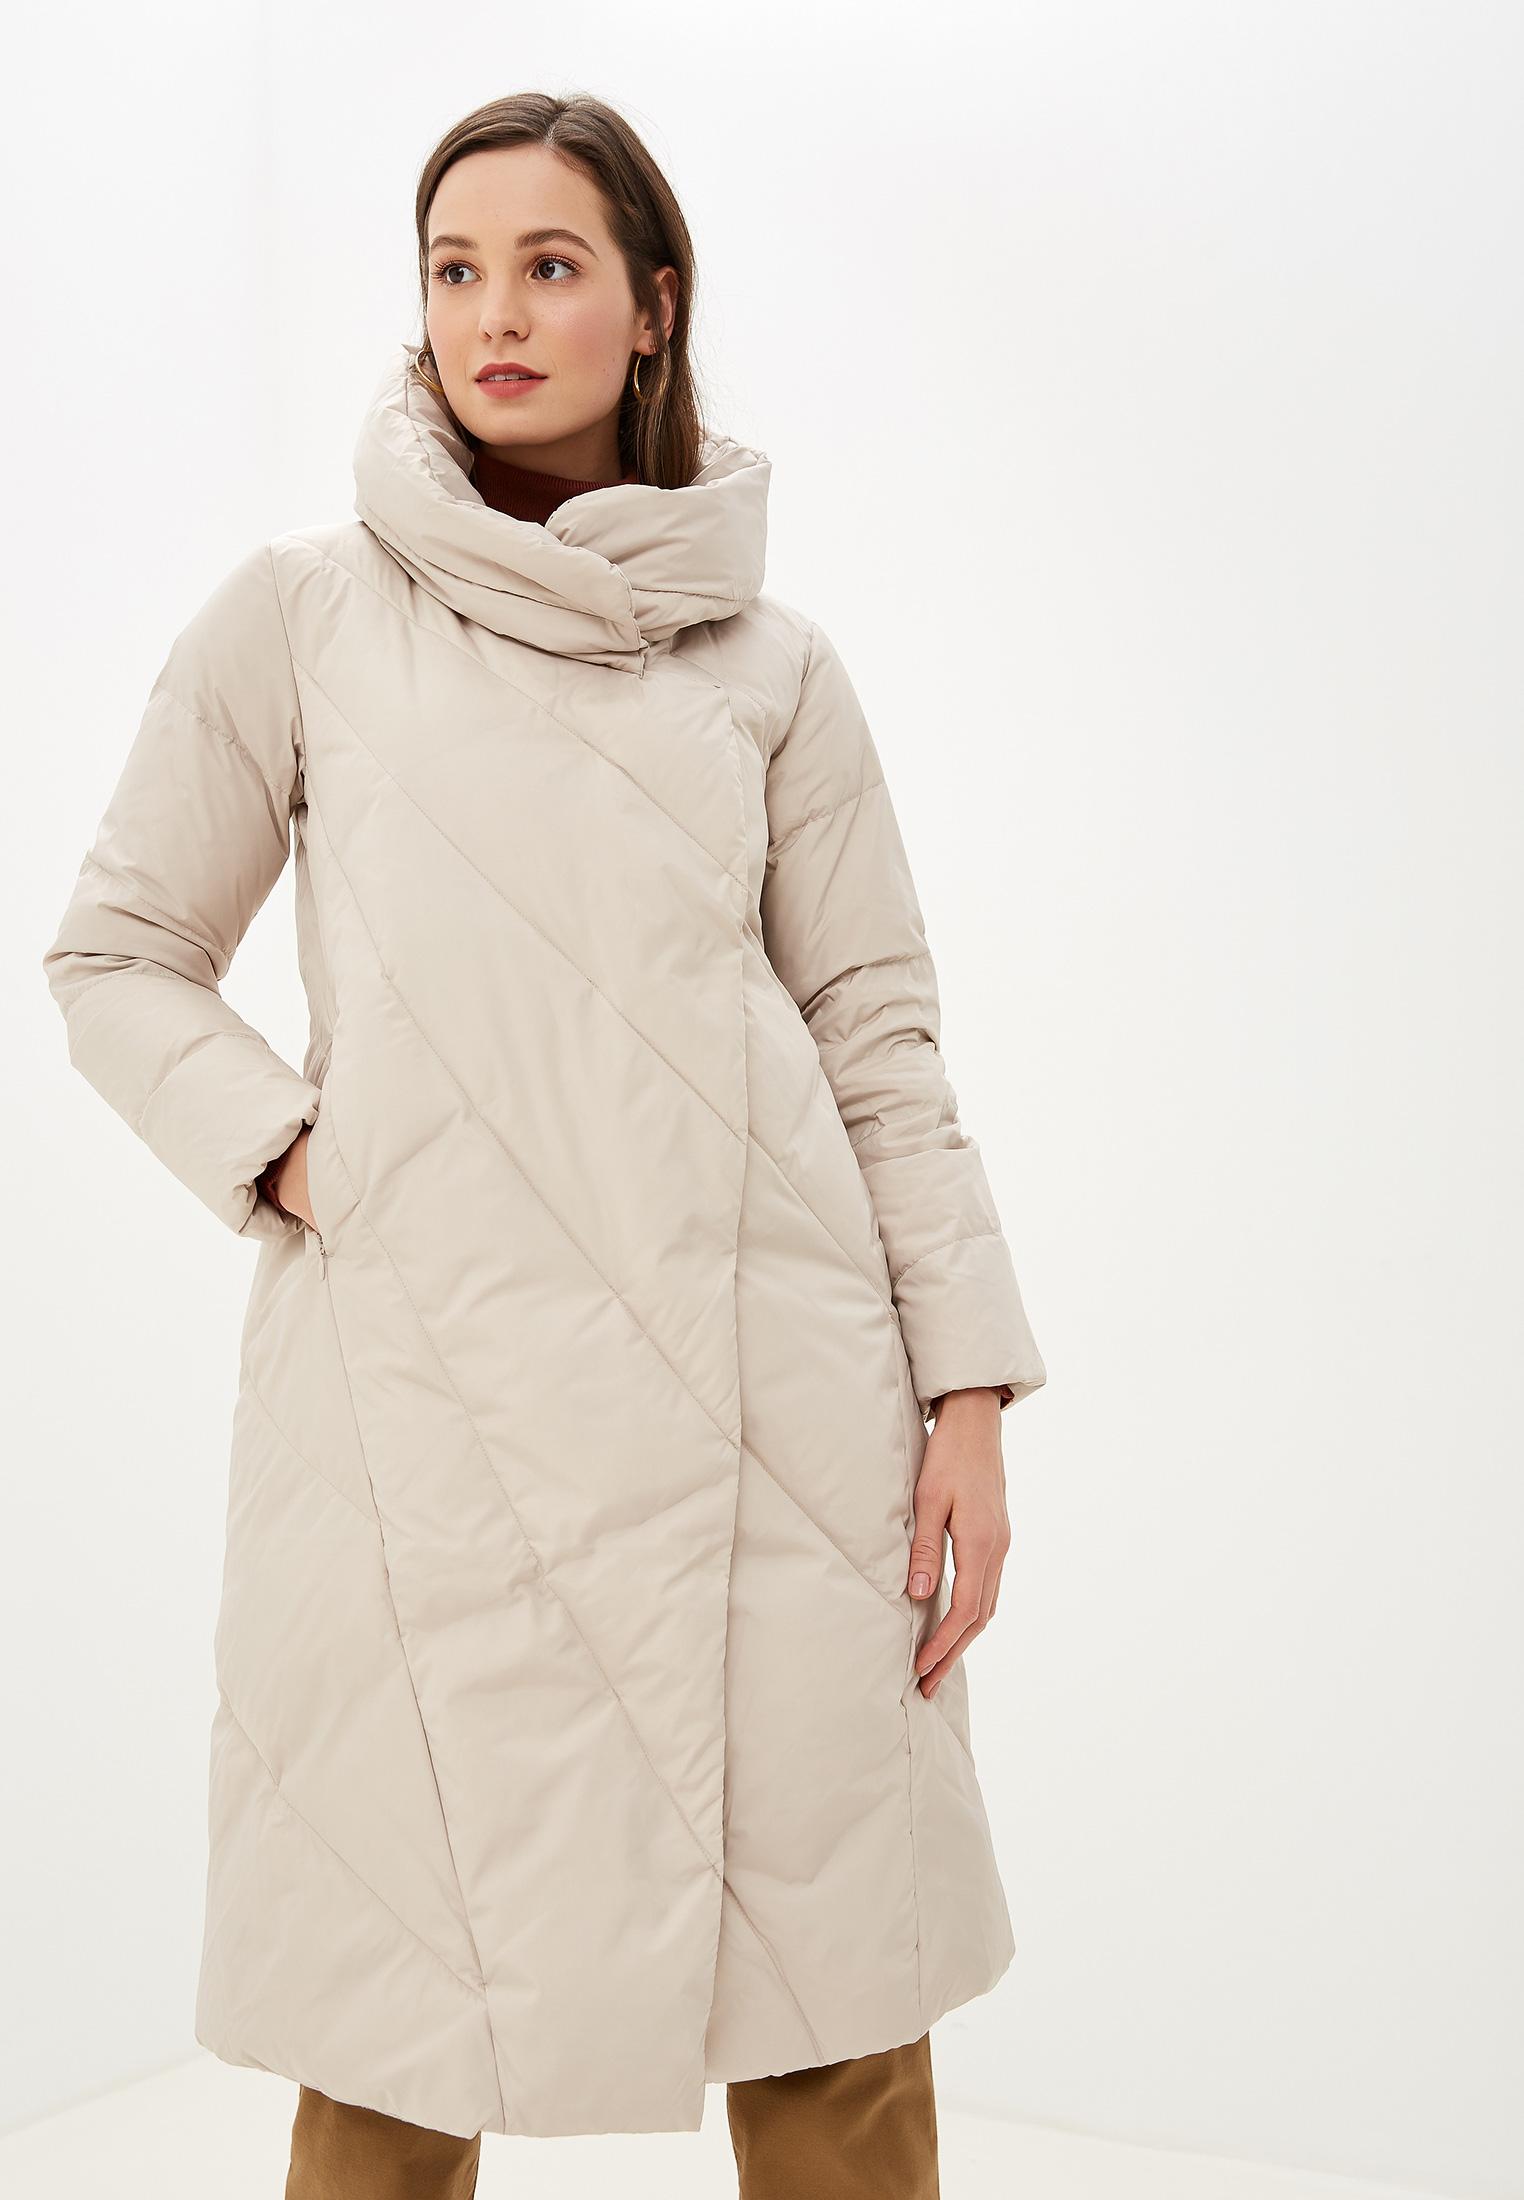 Пуховик, Savage, цвет: серый. Артикул: SA004EWGESB2. Одежда / Верхняя одежда / Пуховики и зимние куртки